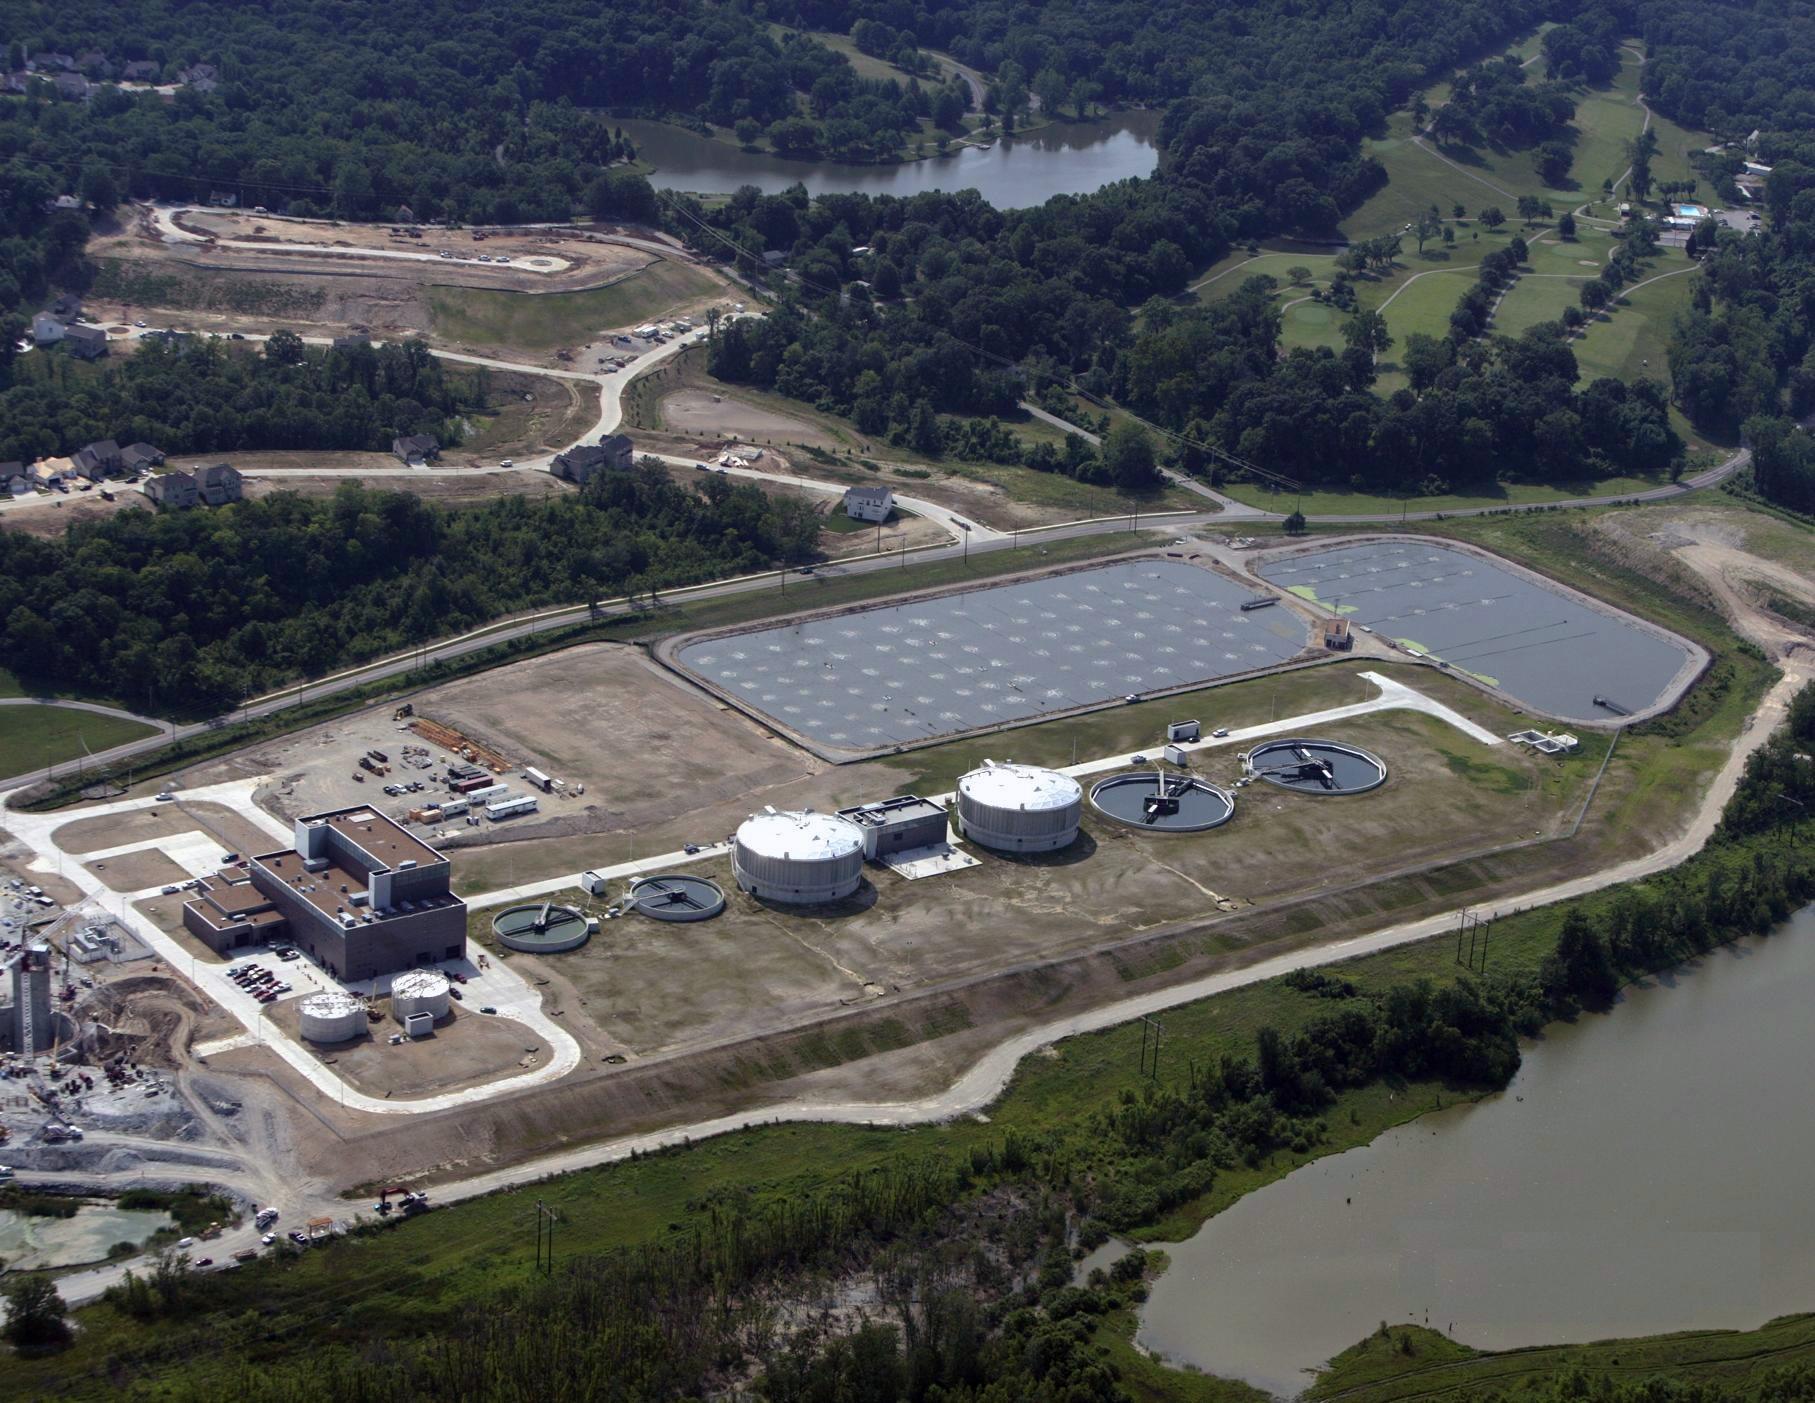 Lower Meramac Wastewater Treatment Plant